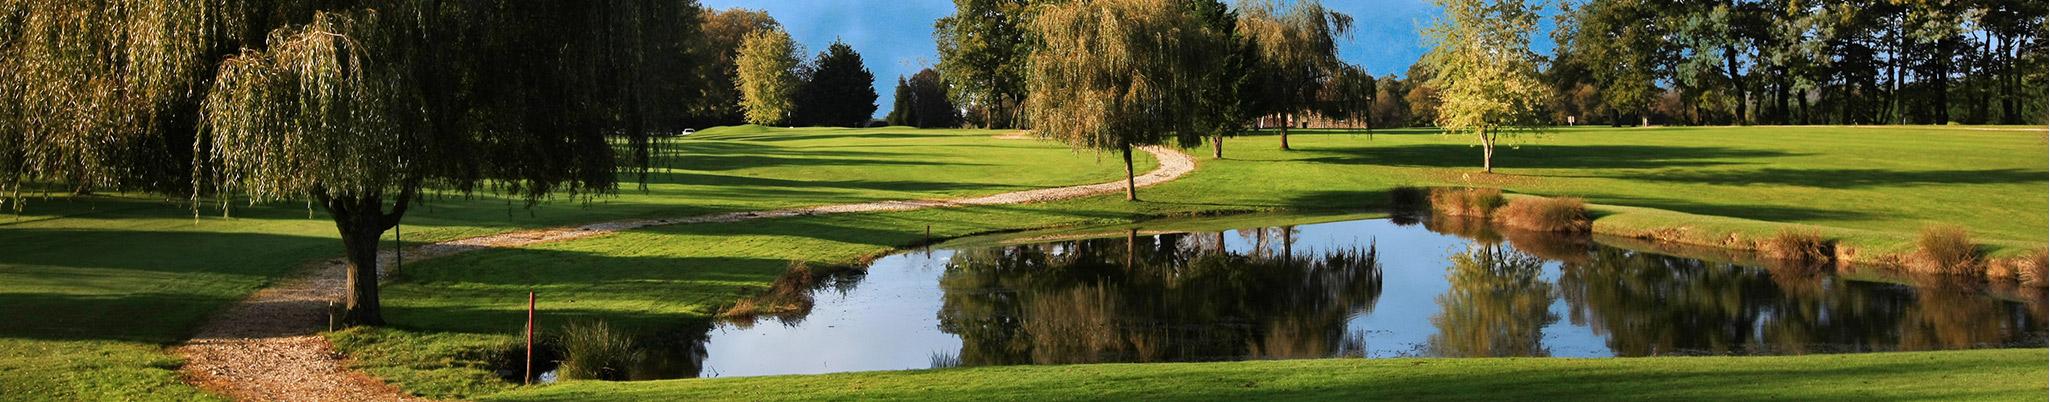 La Sorelle golf Club